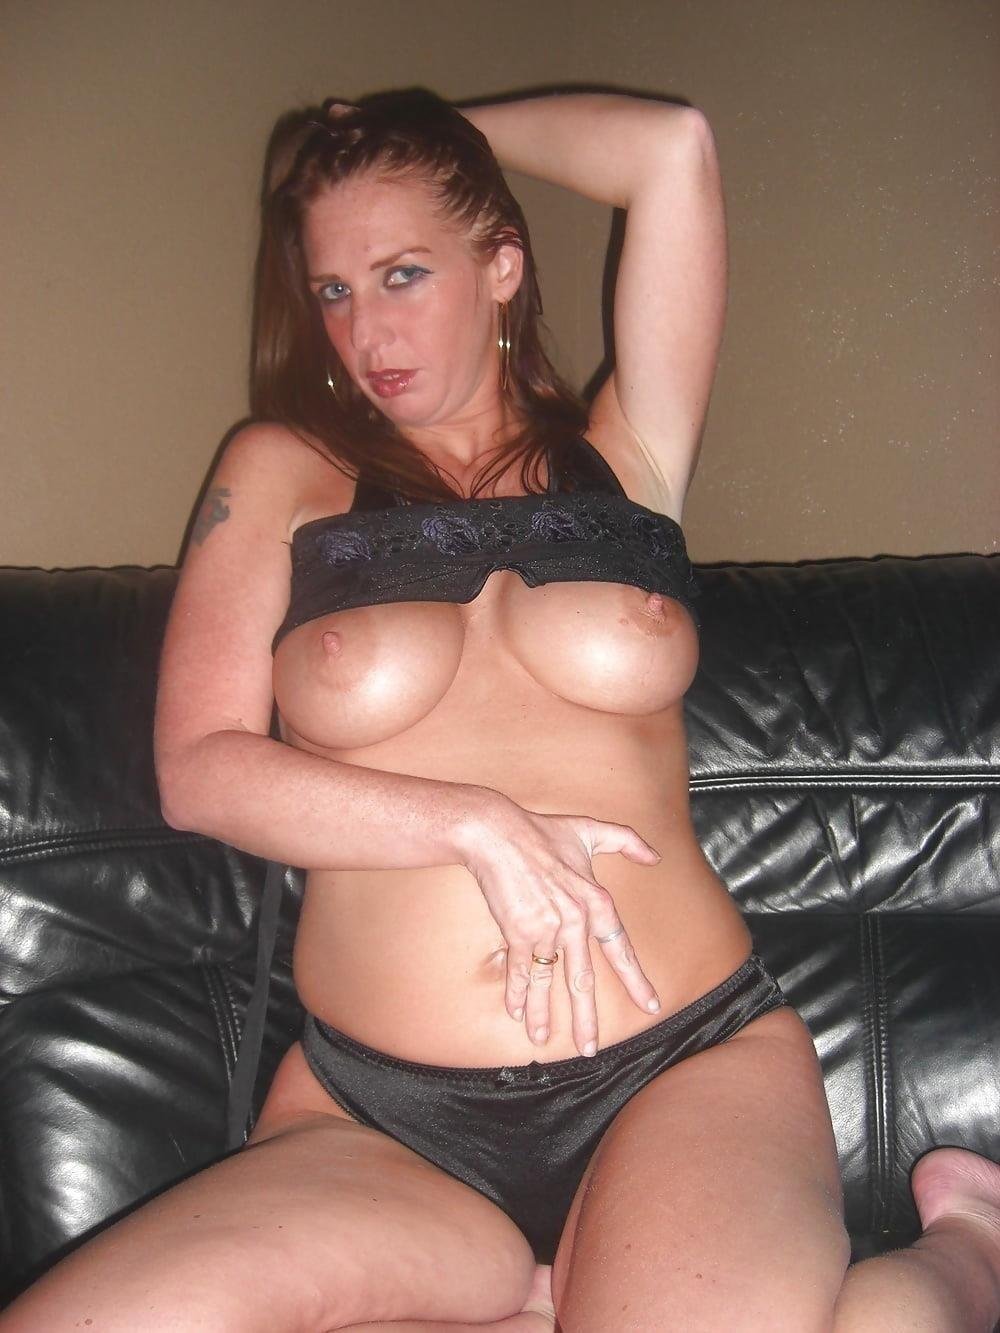 Big tit brunette pics-1001